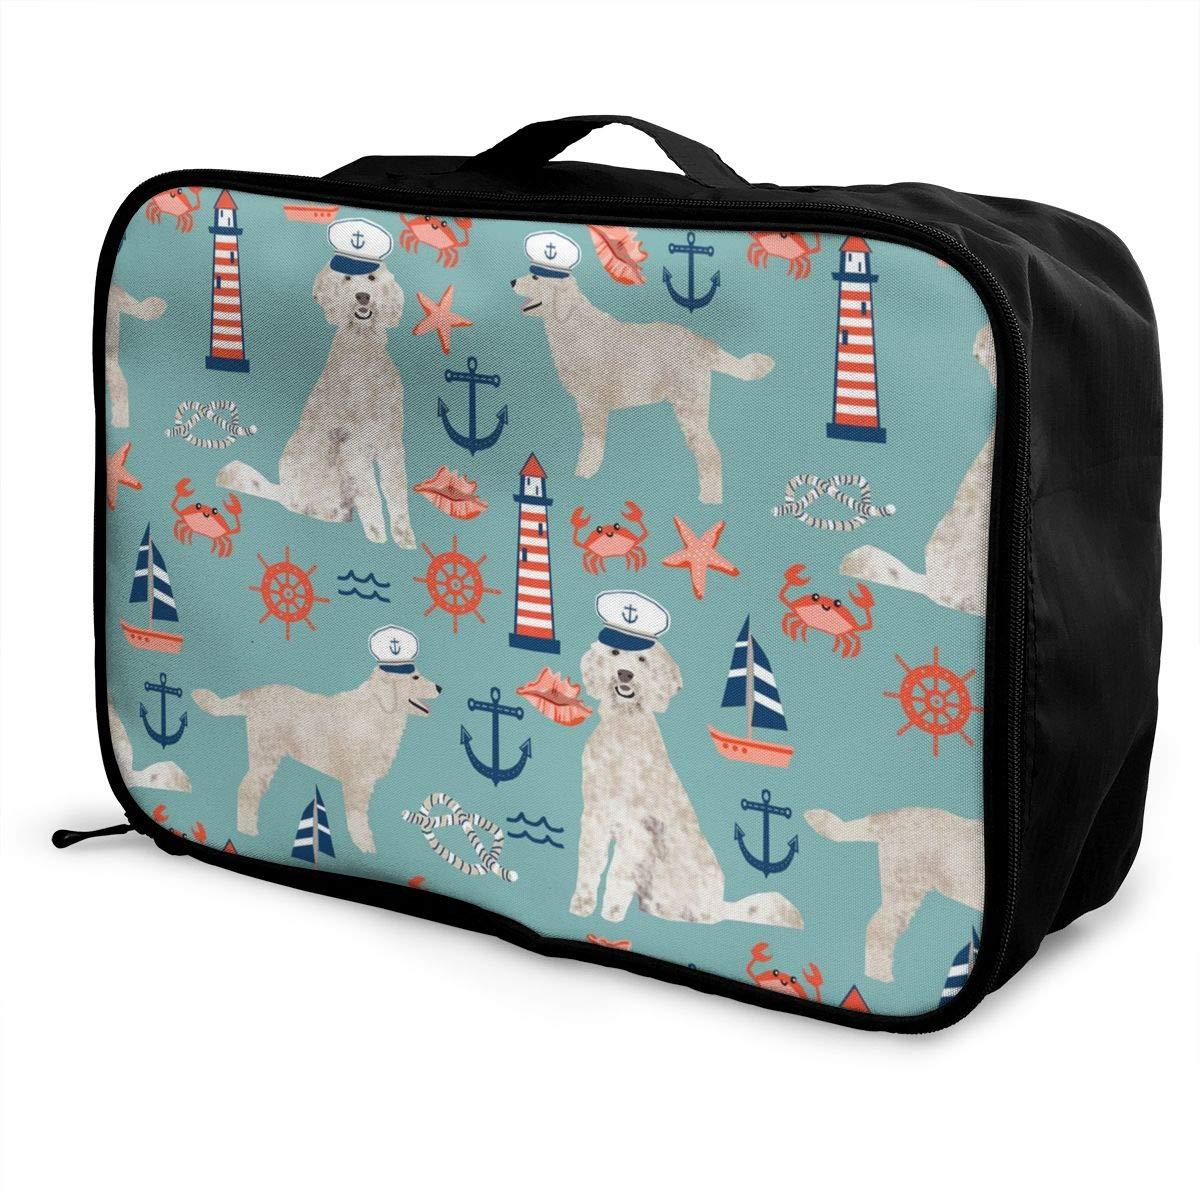 Capitan Golden Doodle Nautical Dog Travel Duffel Bag Casual Large Capacity Portable Luggage Bag Suitcase Storage Bag Luggage Packing Tote Bag Weekend Trip